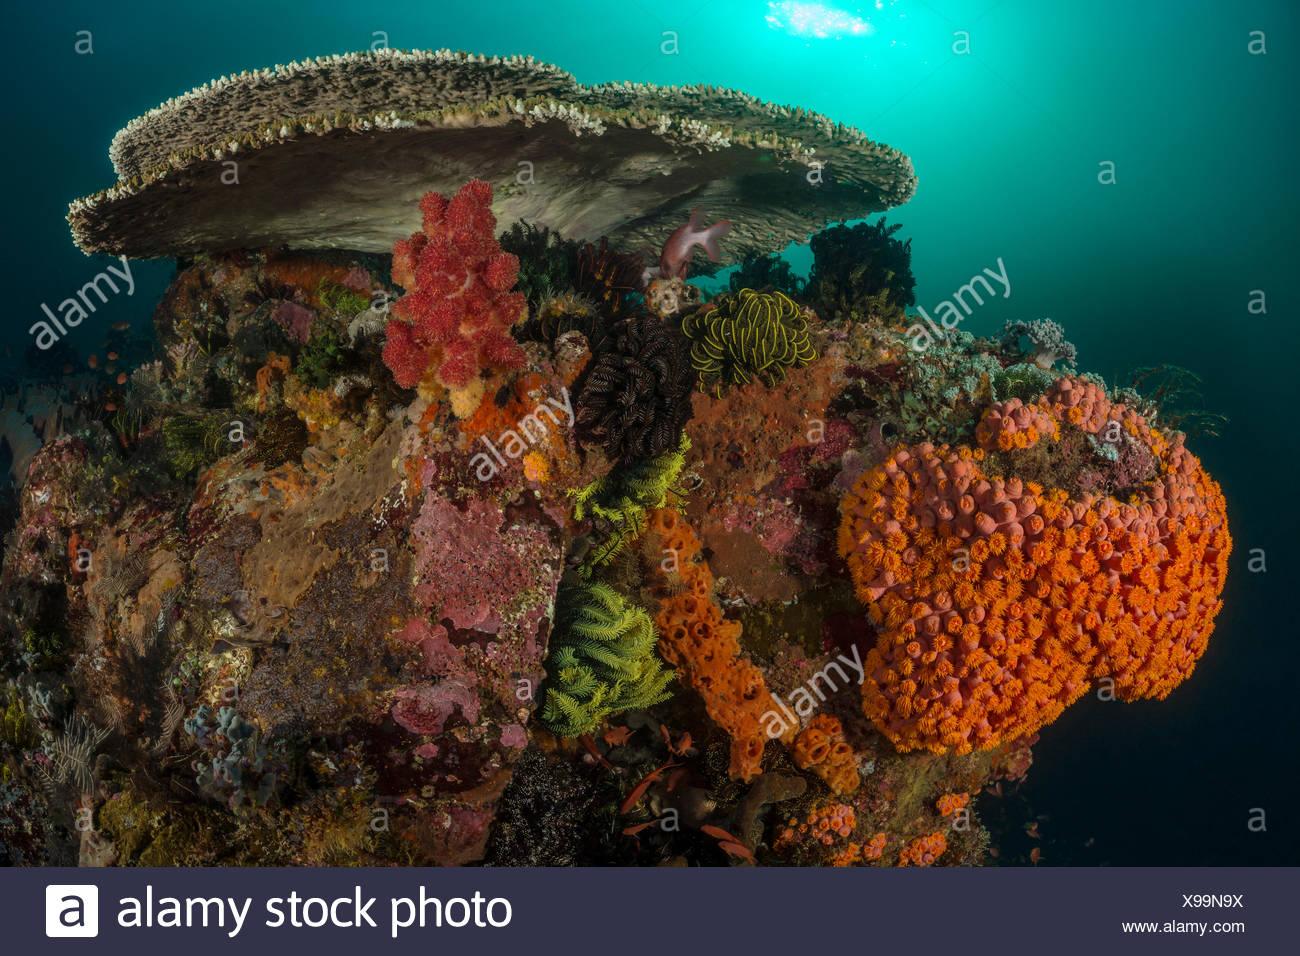 Colored Coral Reef, Tubastrea faulkneri, Komodo, Indonesia - Stock Image